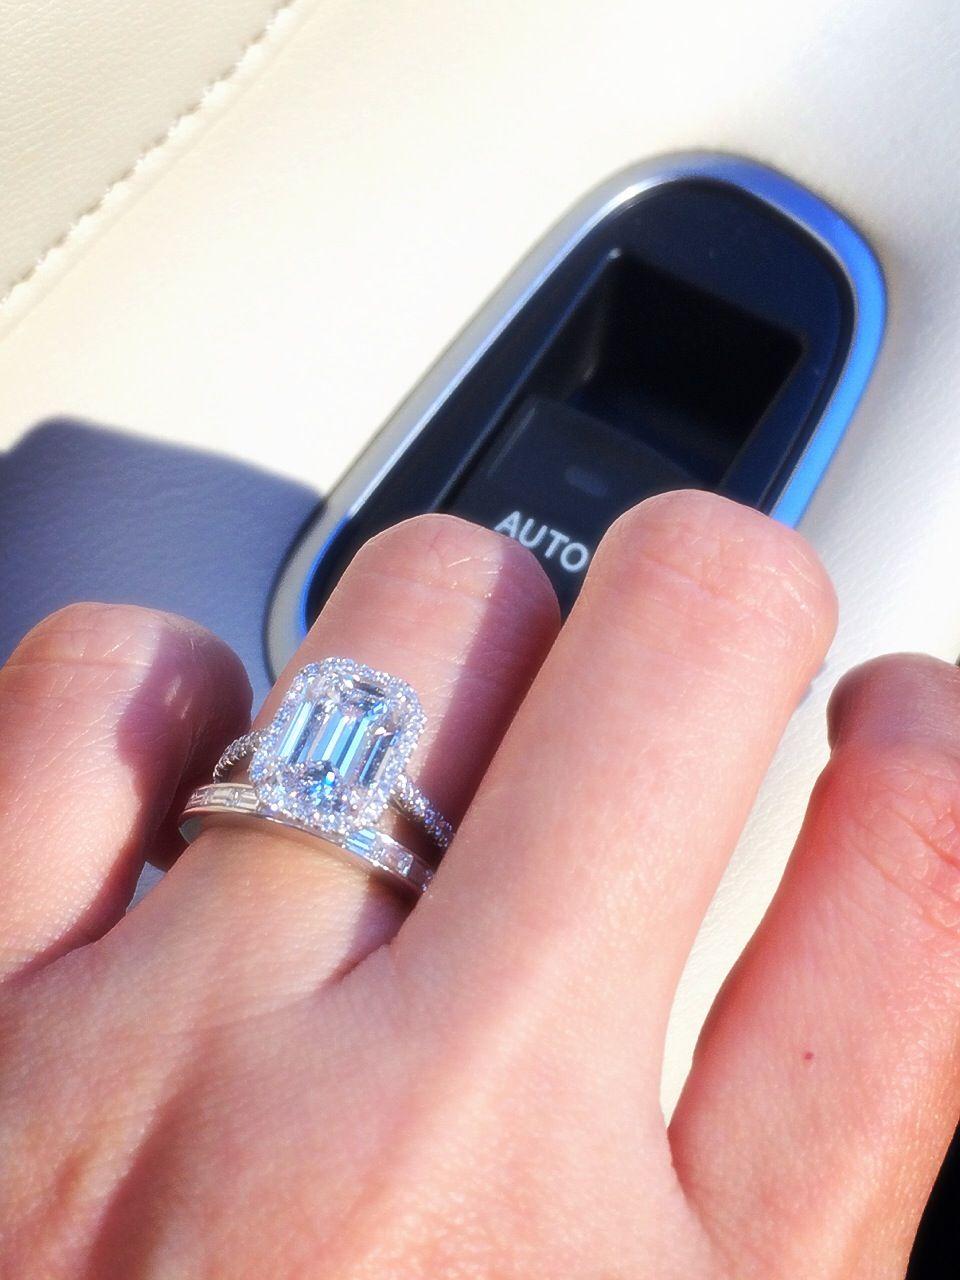 Tiffany & Co. soleste with an emerald cut halo diamond, color E,VVS1 ...